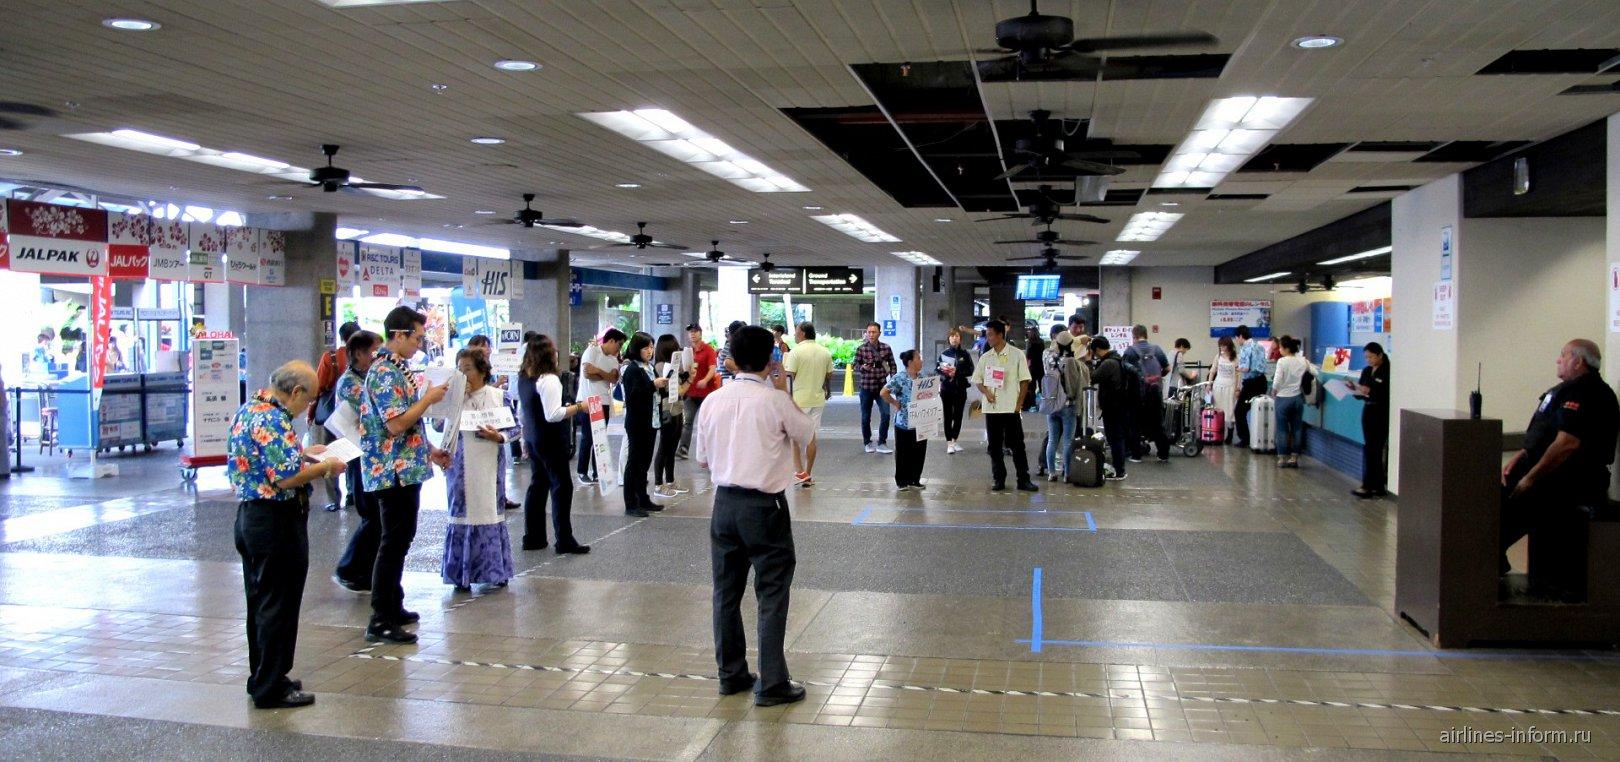 Зал прилета аэропорта Гонолулу